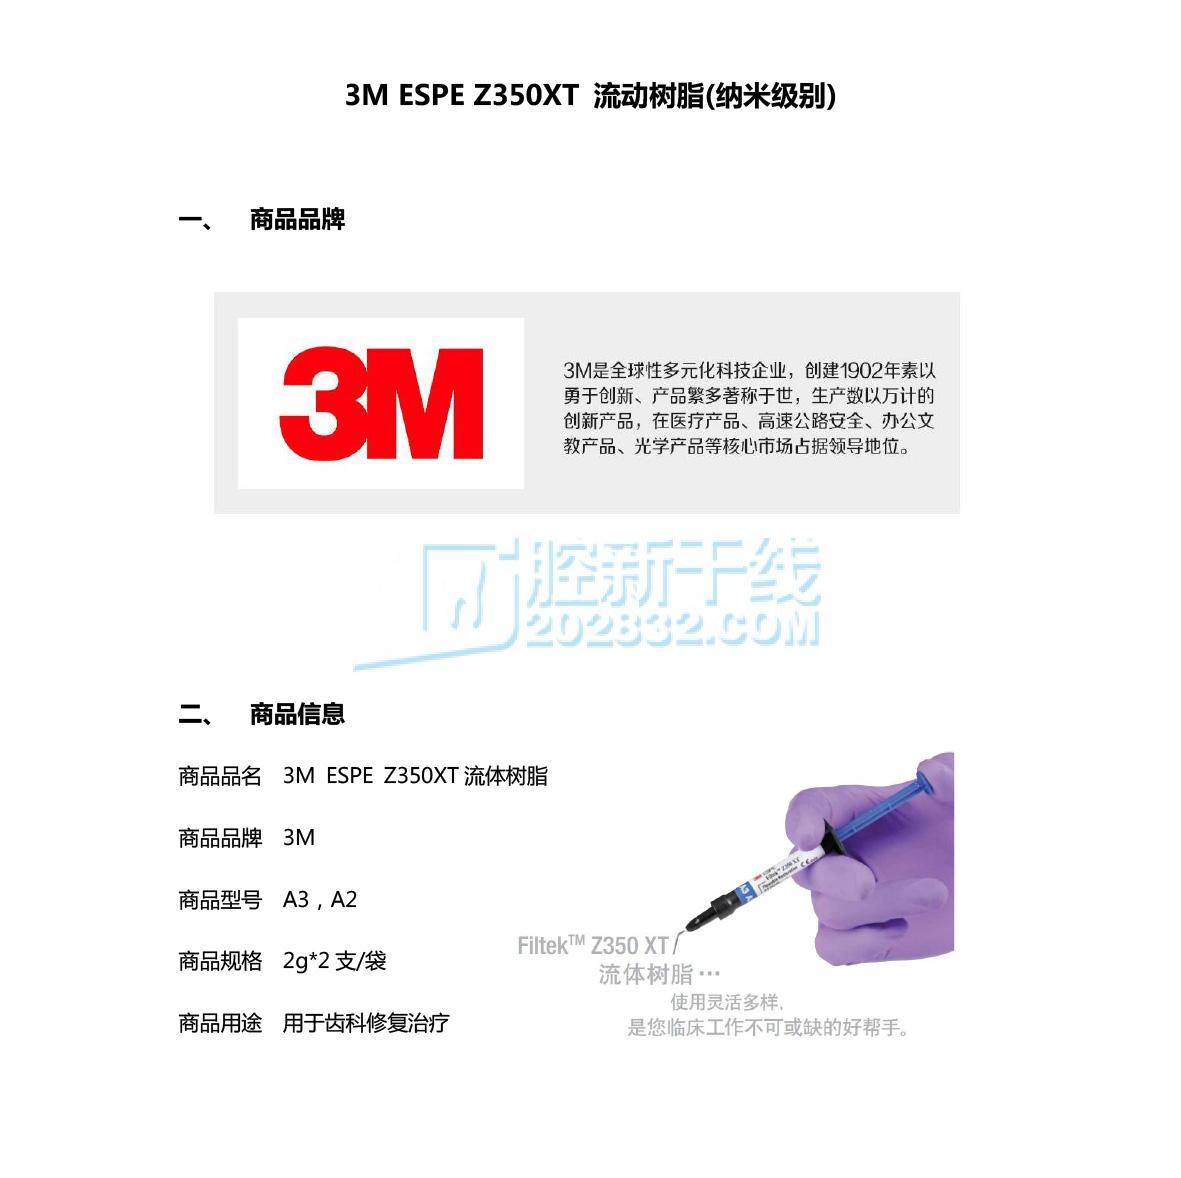 3M ESPE Z350XT 流动树脂(纳米级别)3M流体树脂 A3色注射器装 2g2支 20个注射头-1.jpg